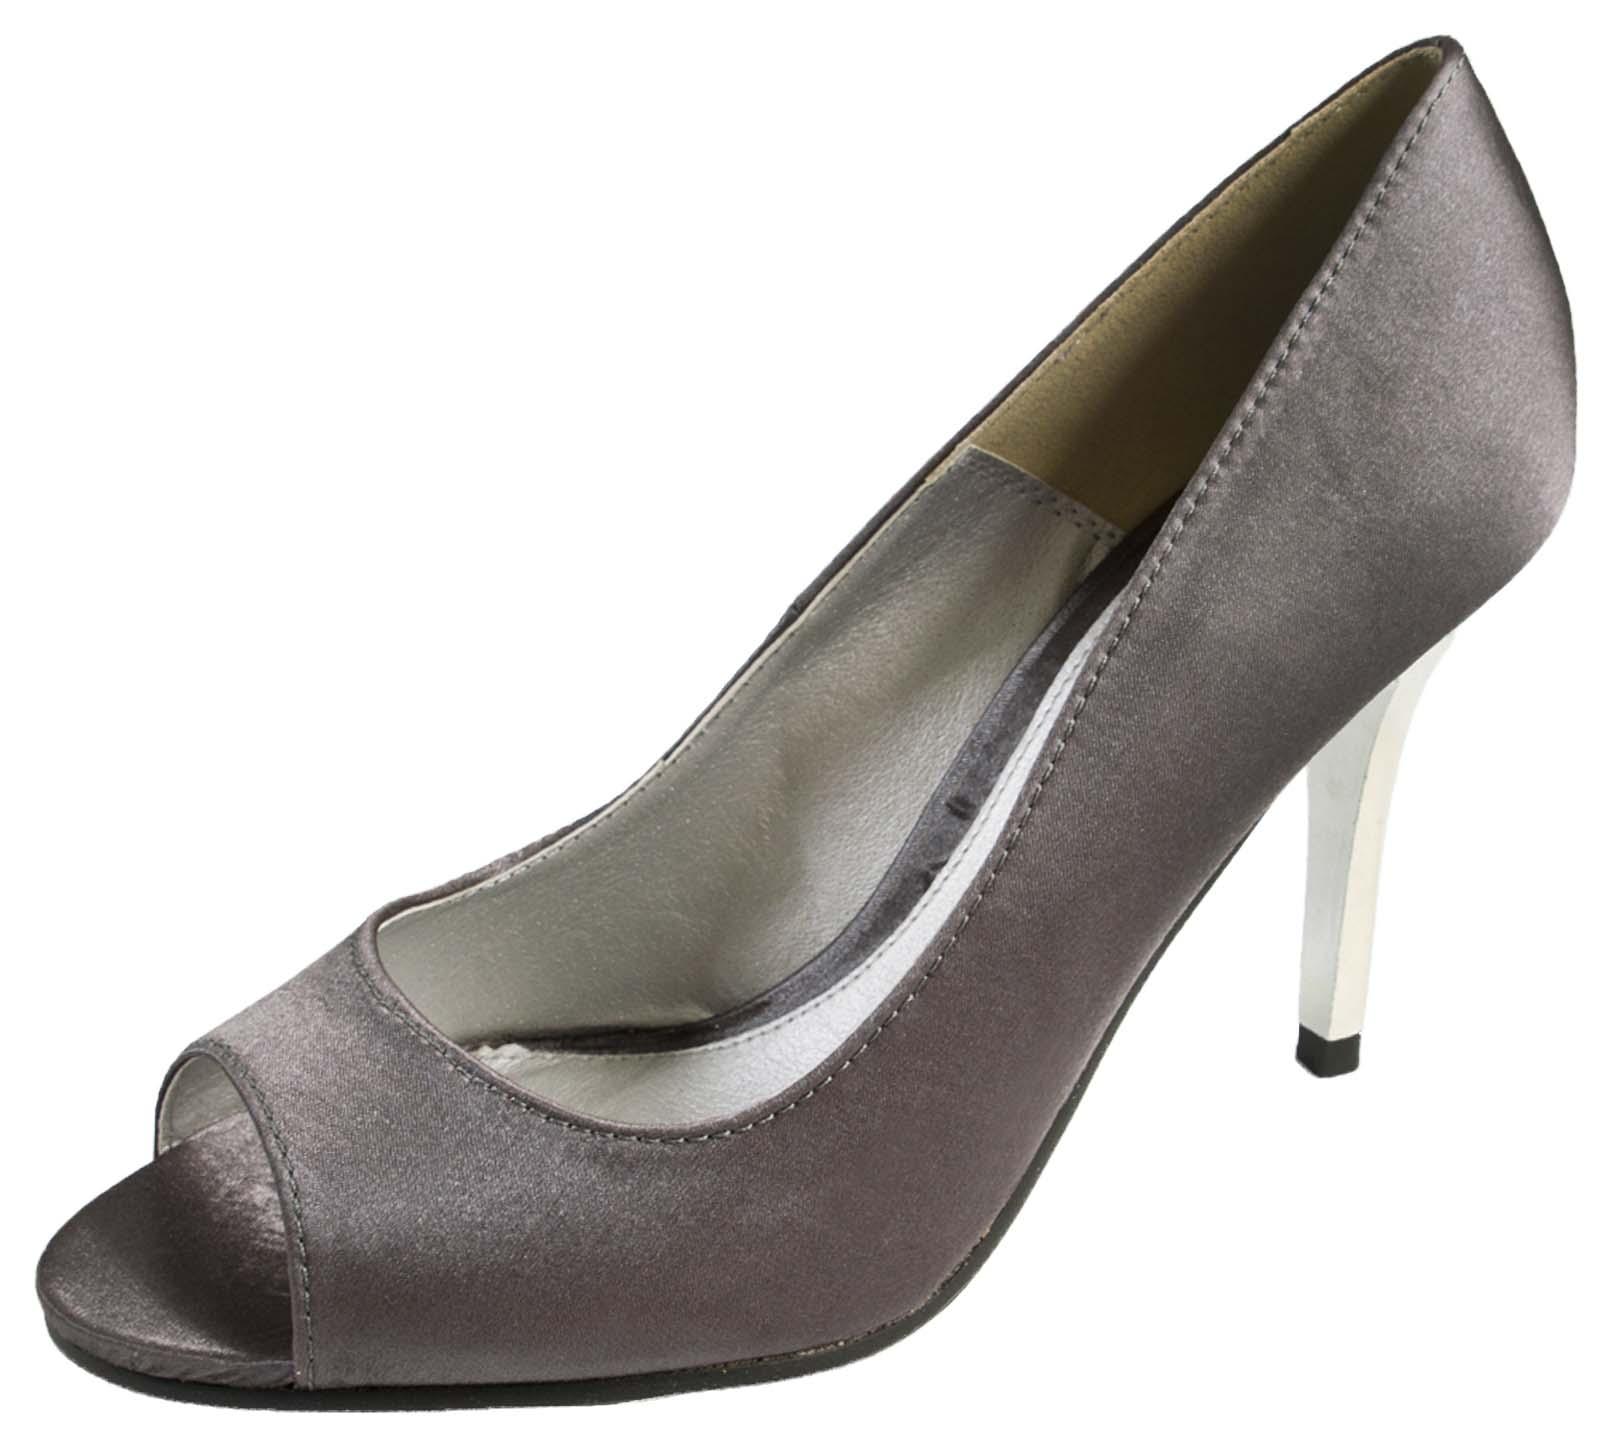 womens satin peep toe sandals with mirror heel stiletto. Black Bedroom Furniture Sets. Home Design Ideas